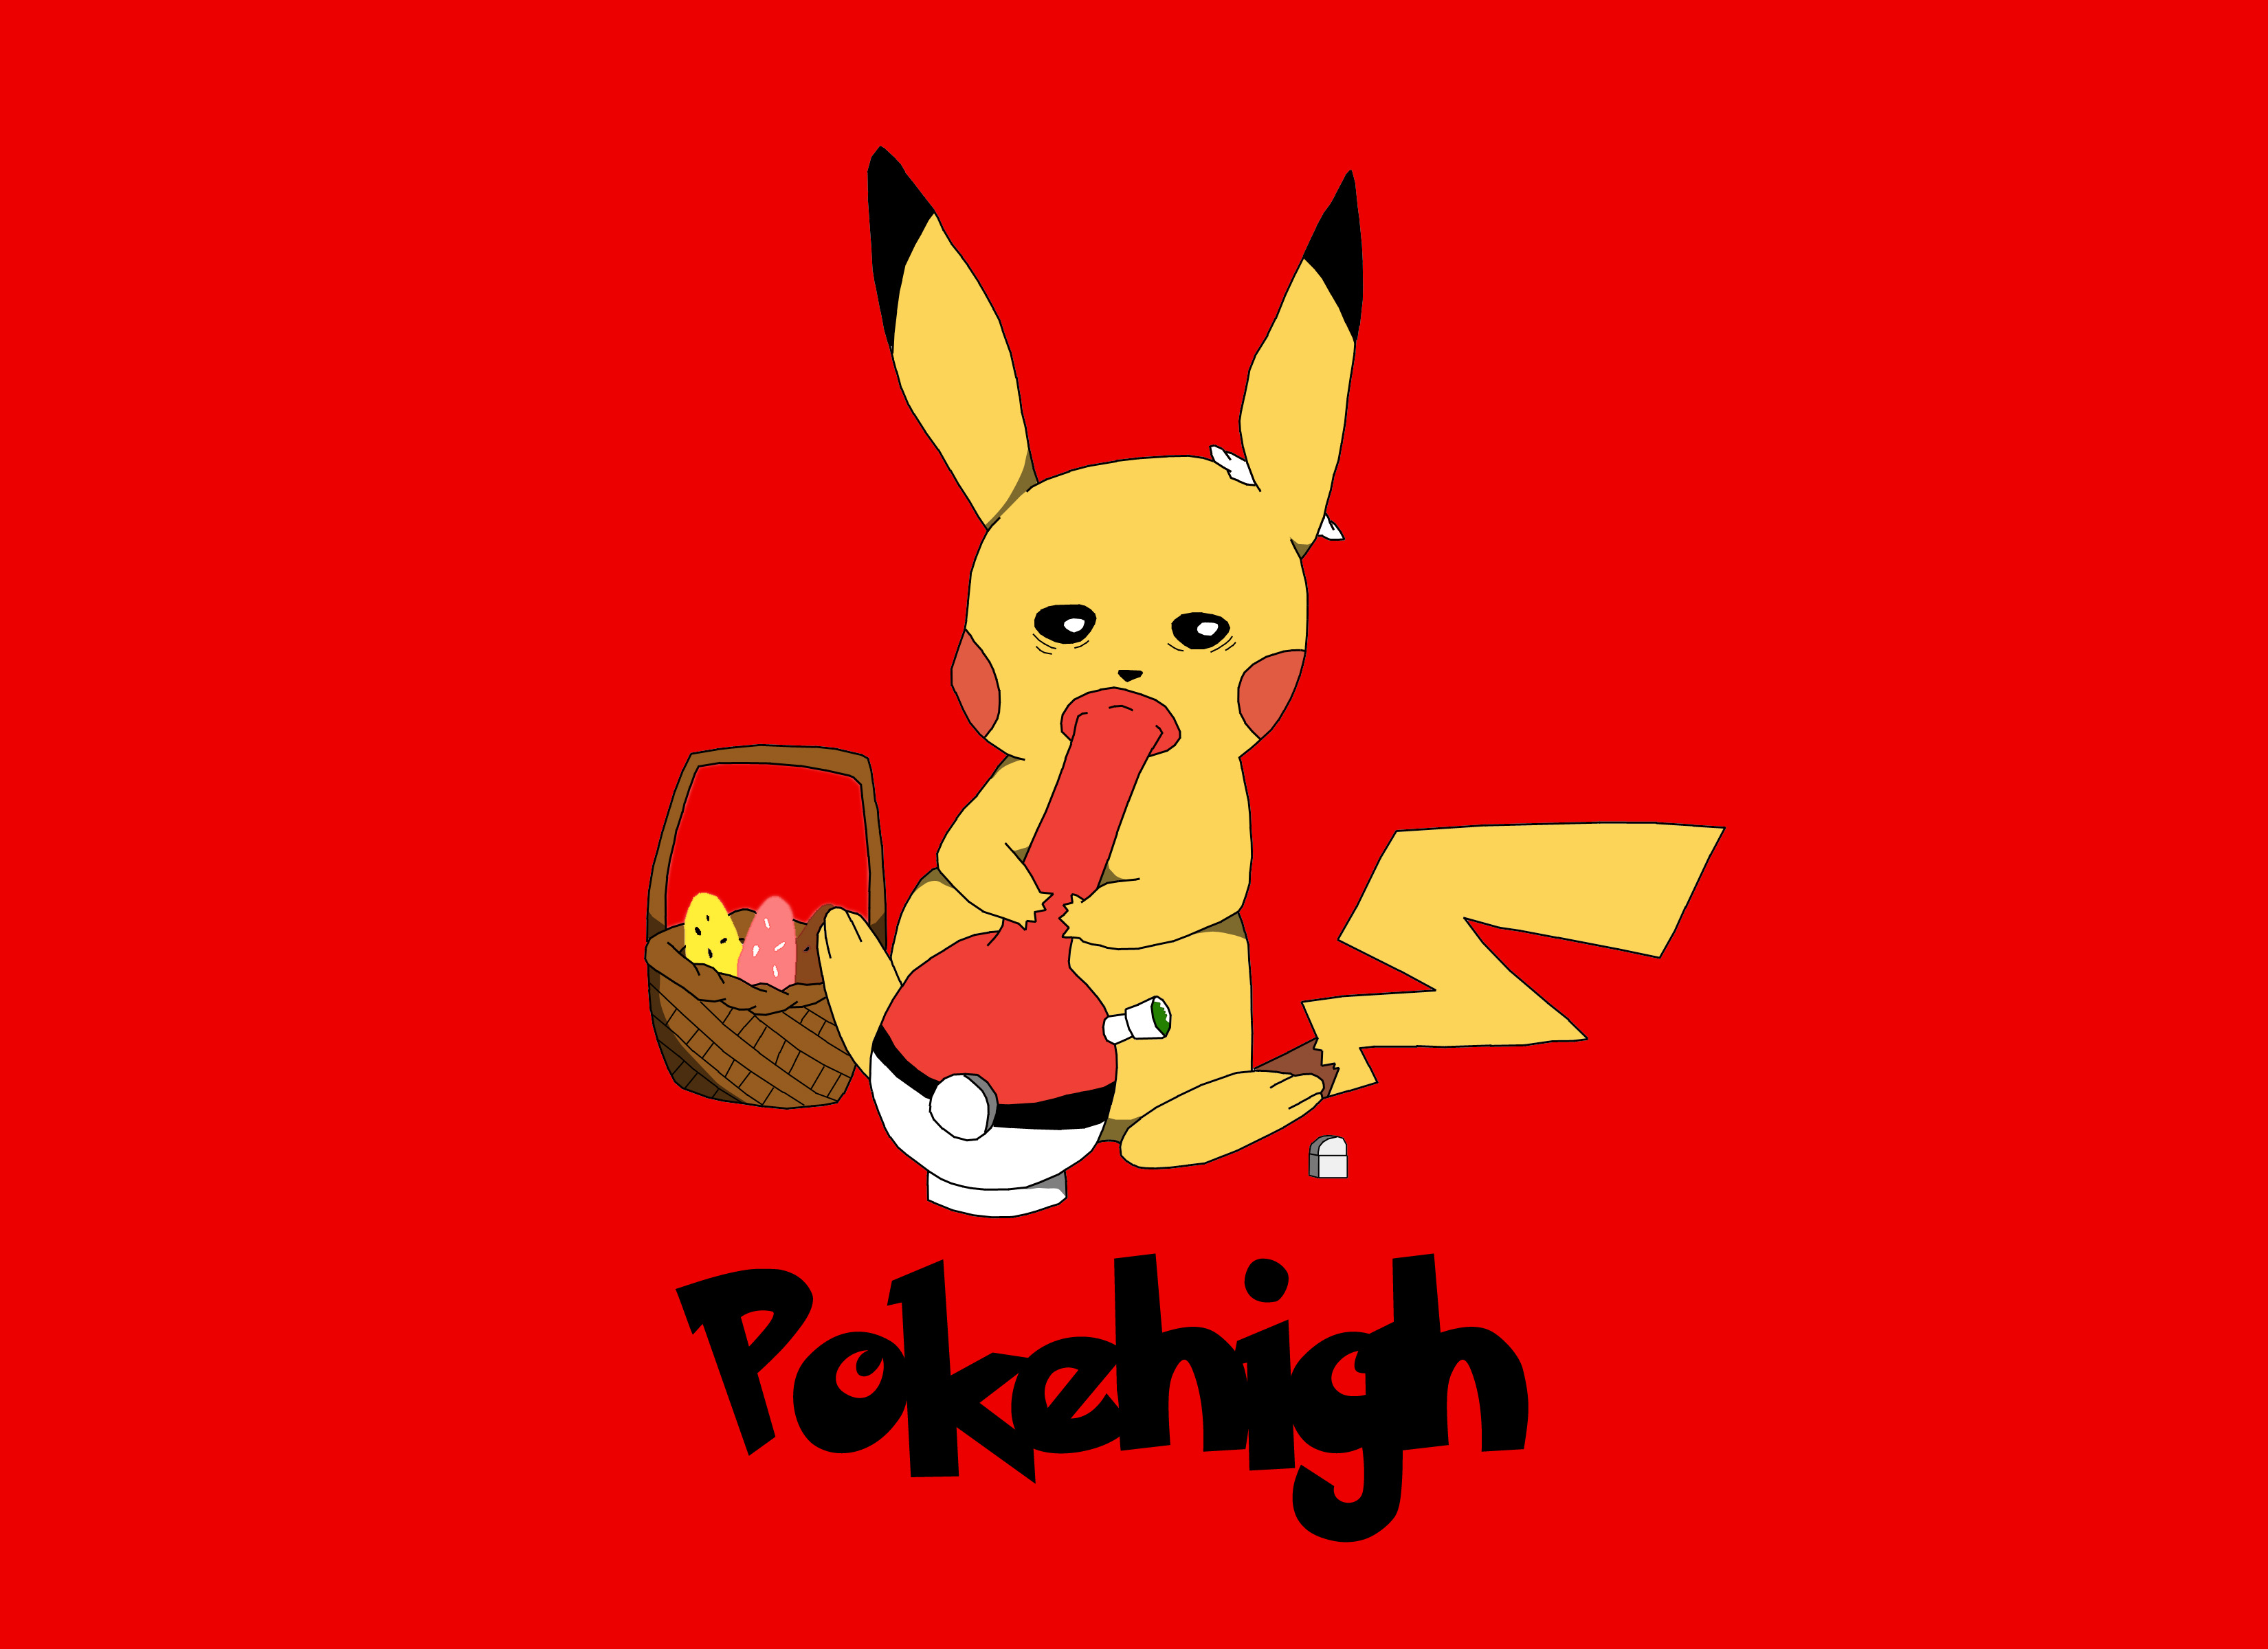 pokehigh